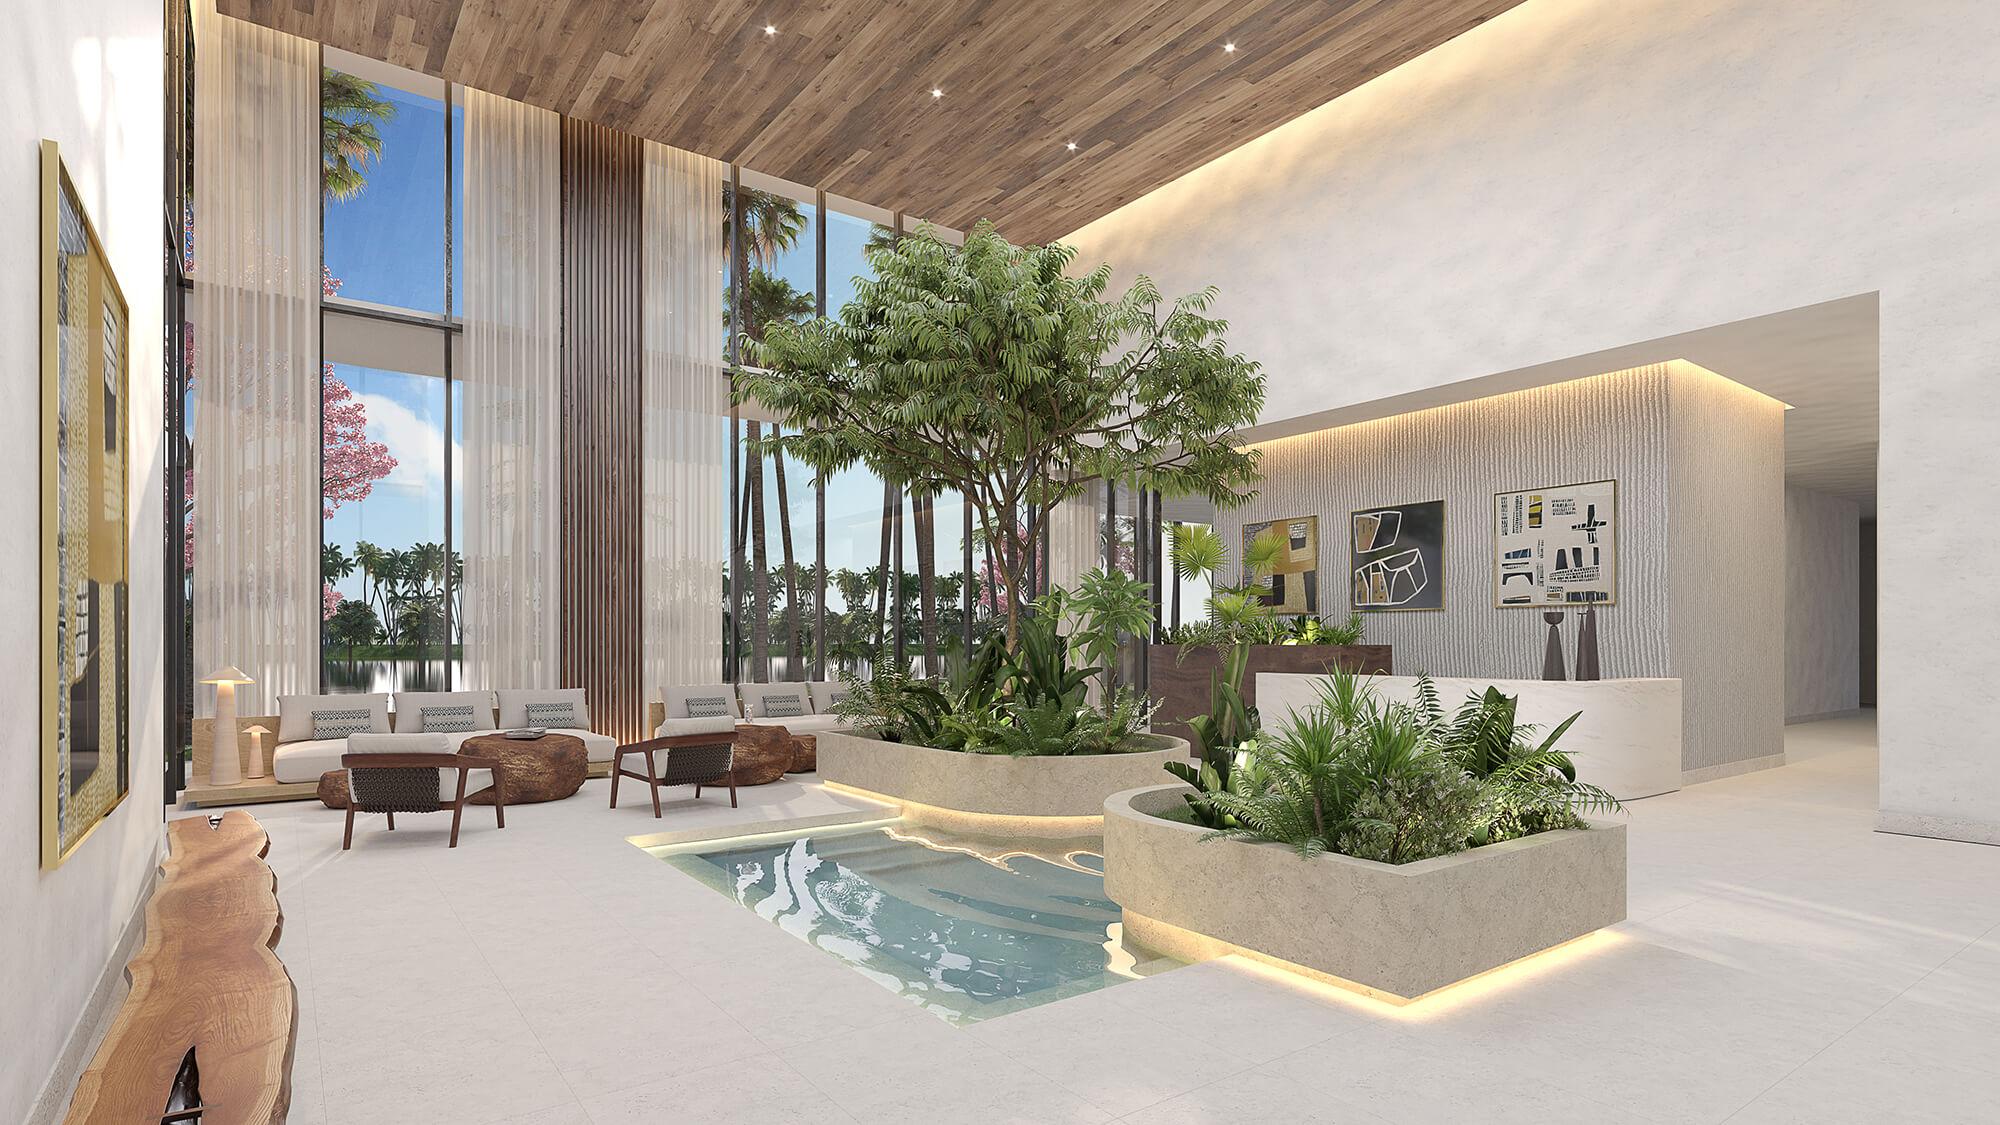 Luxury lobby interior design at the SLS Residences Cancun.